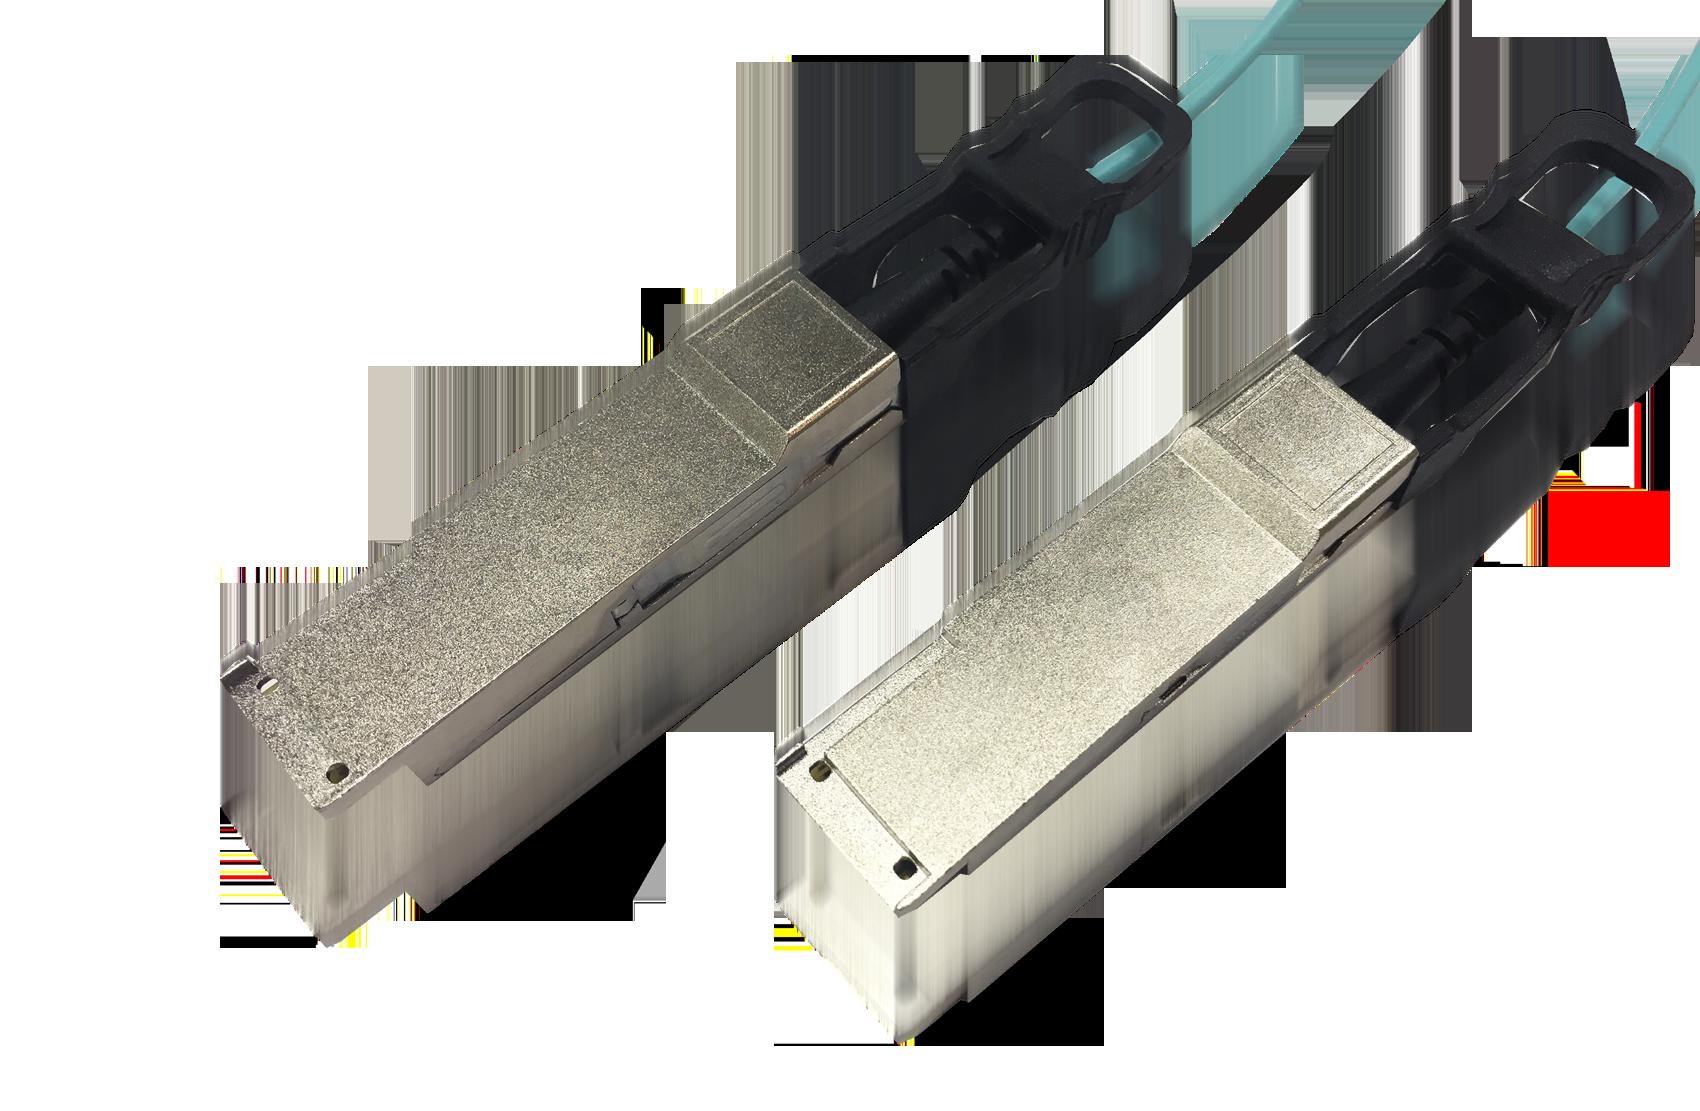 312001 QSFP+ 40G AOC Cable